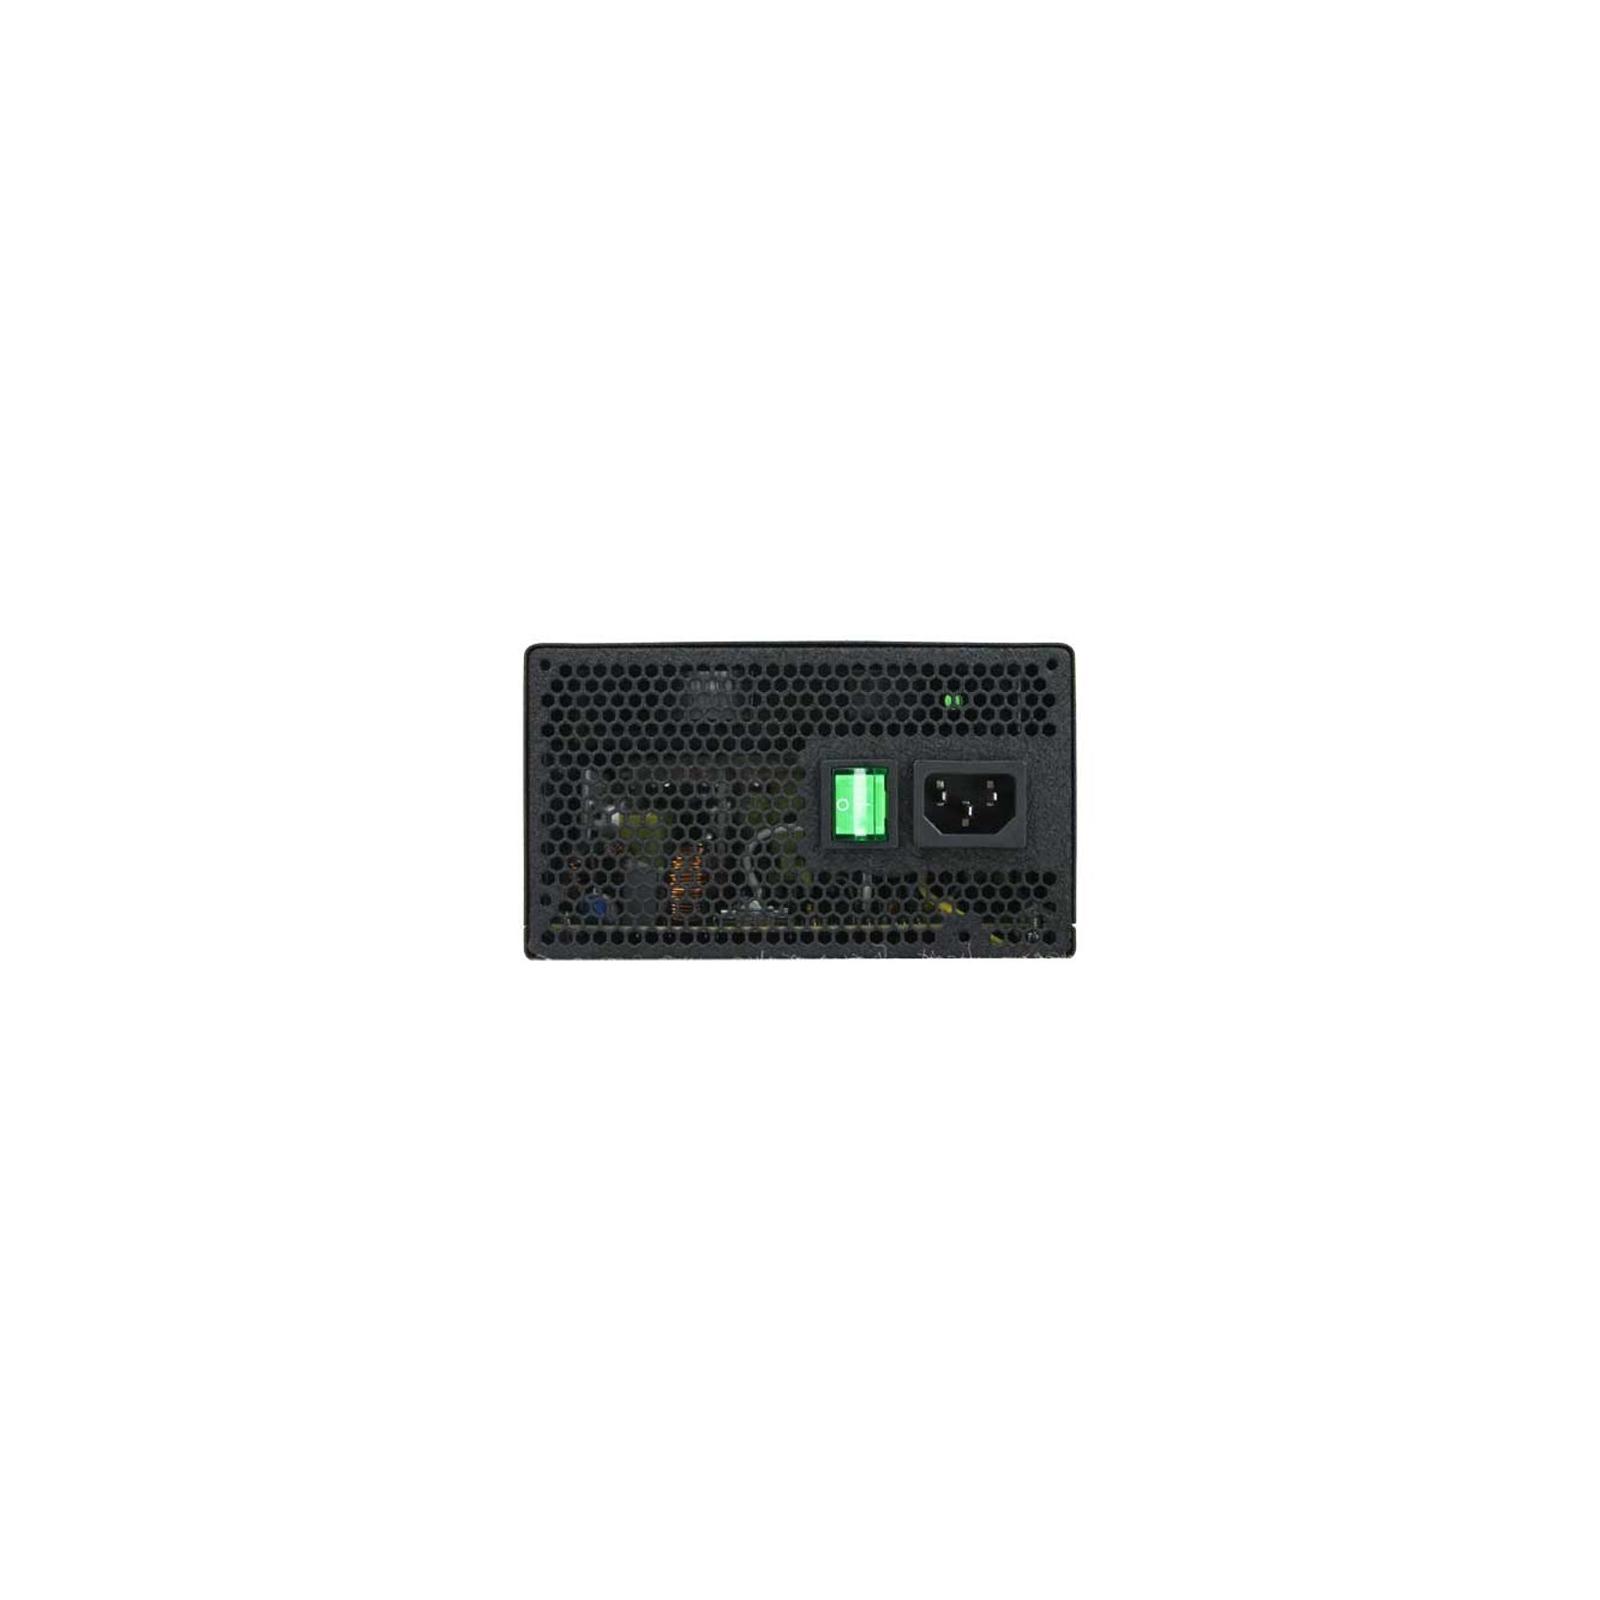 Блок питания Gamemax 800W (GM-800) изображение 3